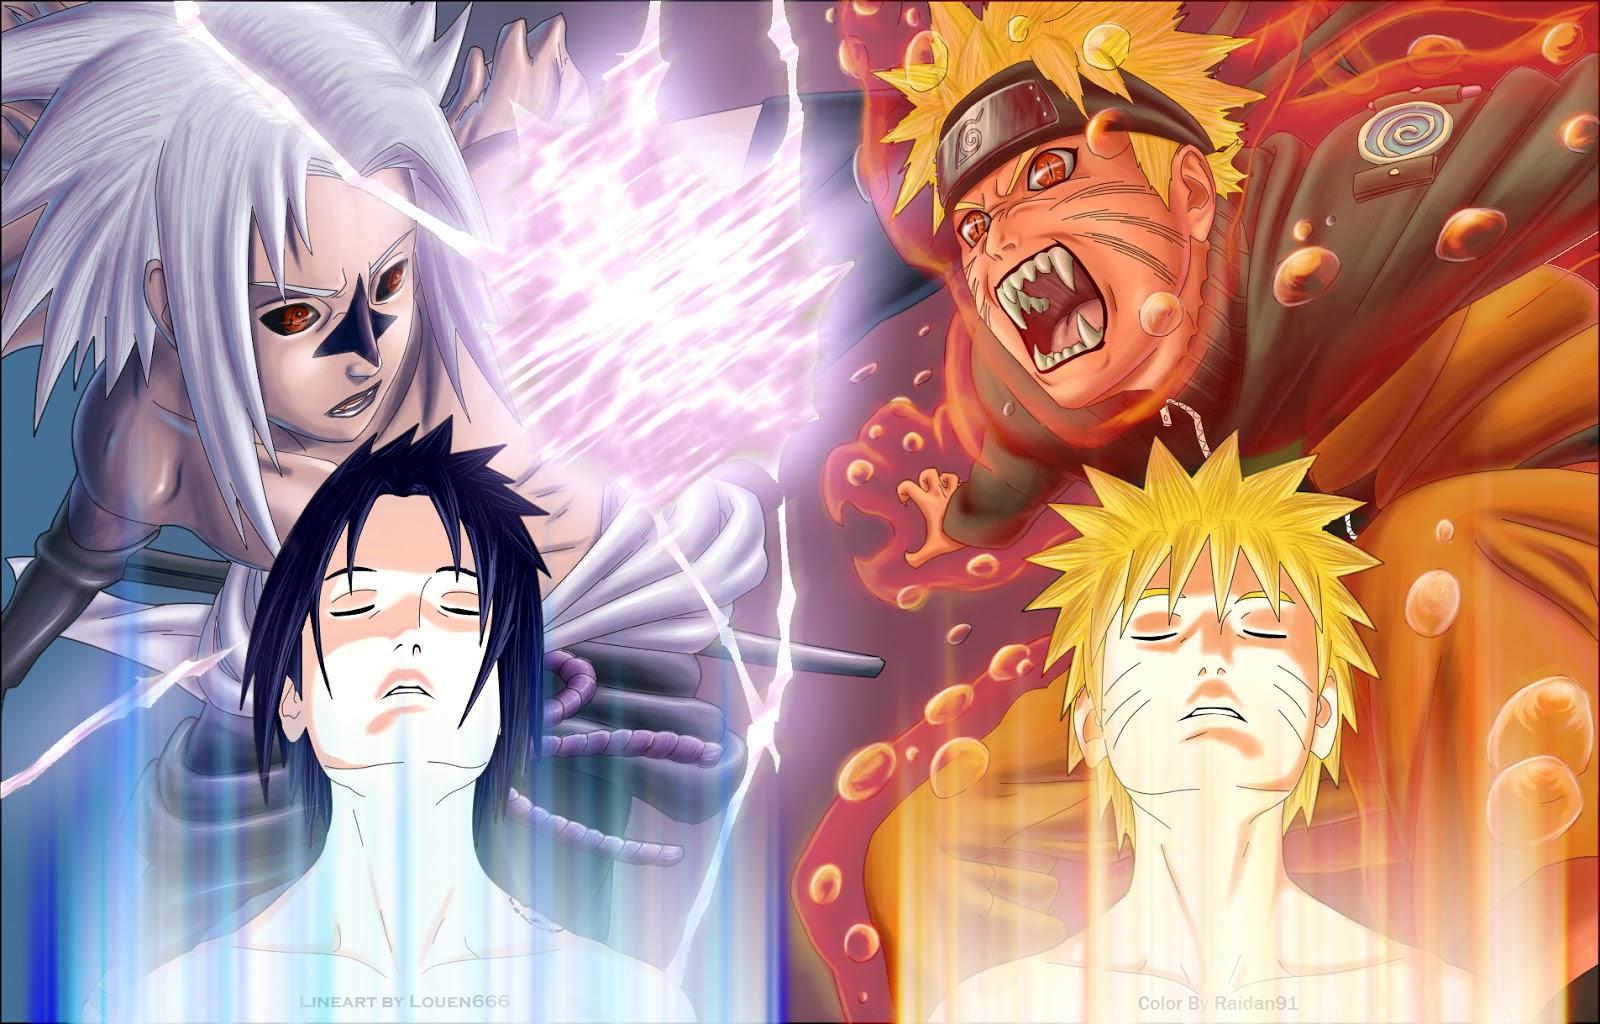 hinh anh naruto vs sasuke cuc chat 6 25 Hình Ảnh Naruto Vs Sasuke Cực Chất